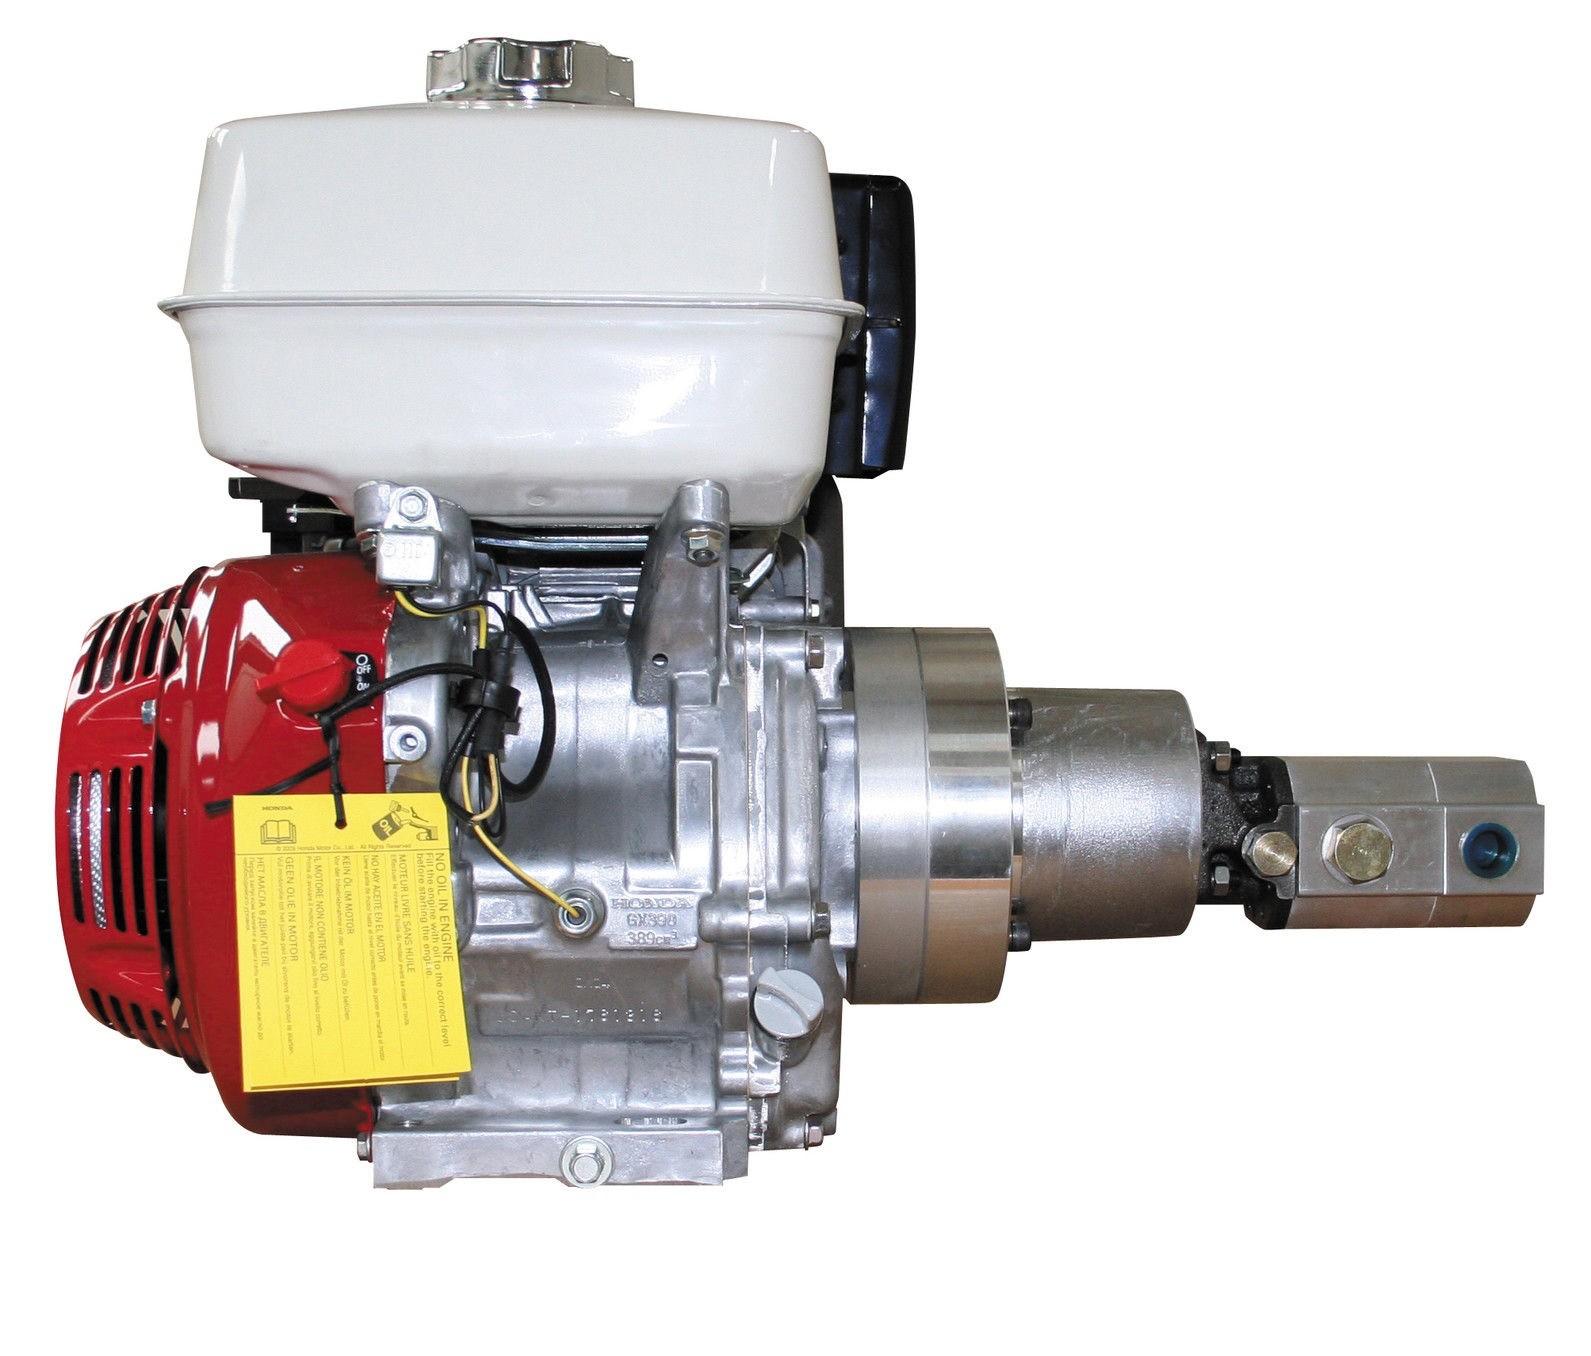 Honda 5 Hp Engine Diagram Pvl Flywheel For 6 Clone Parts Of